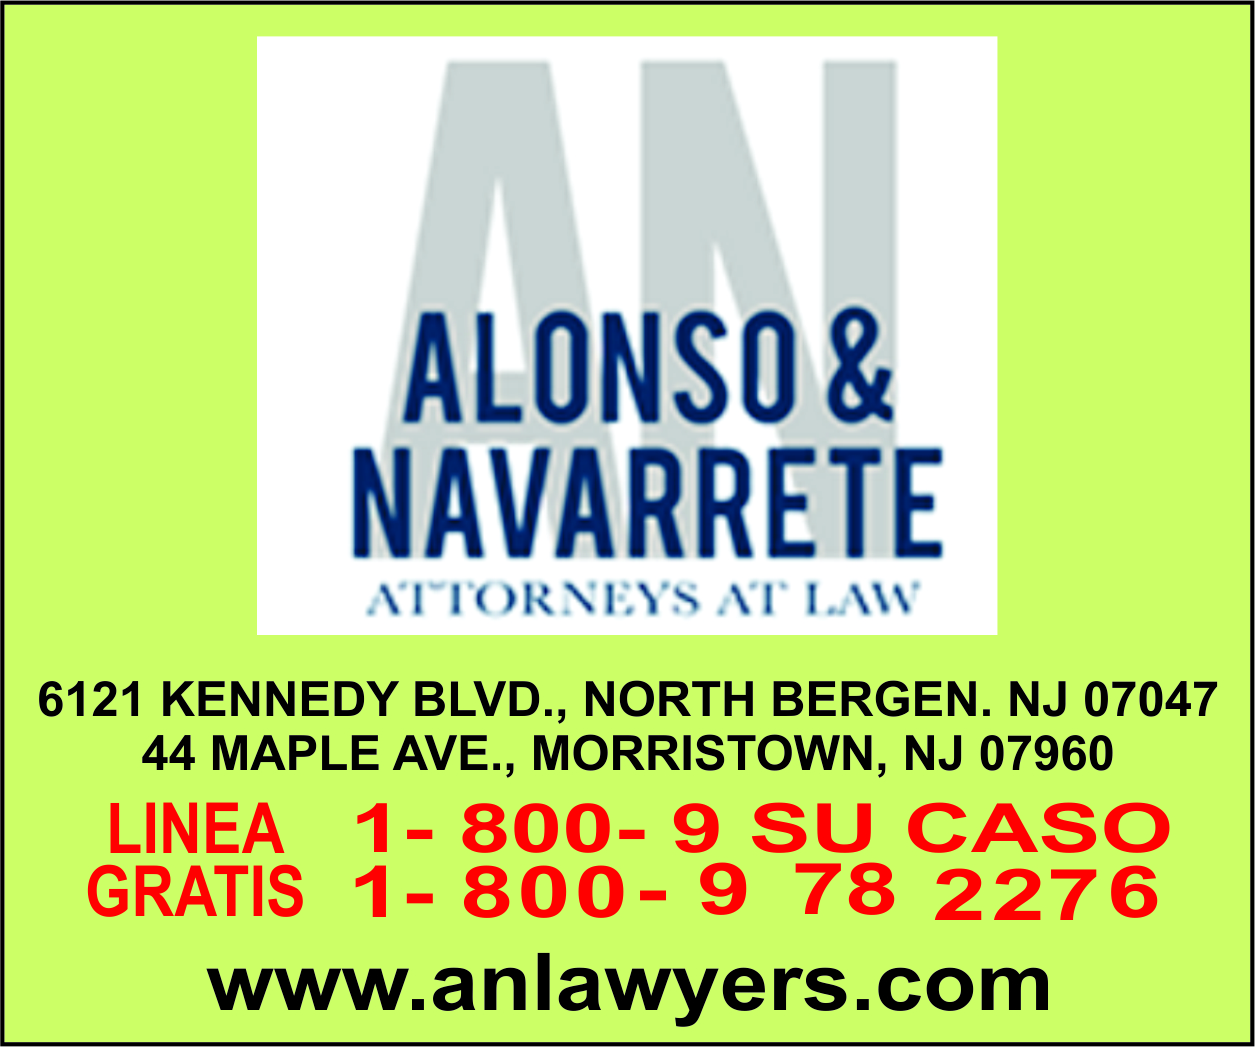 Alonso y Navarrete